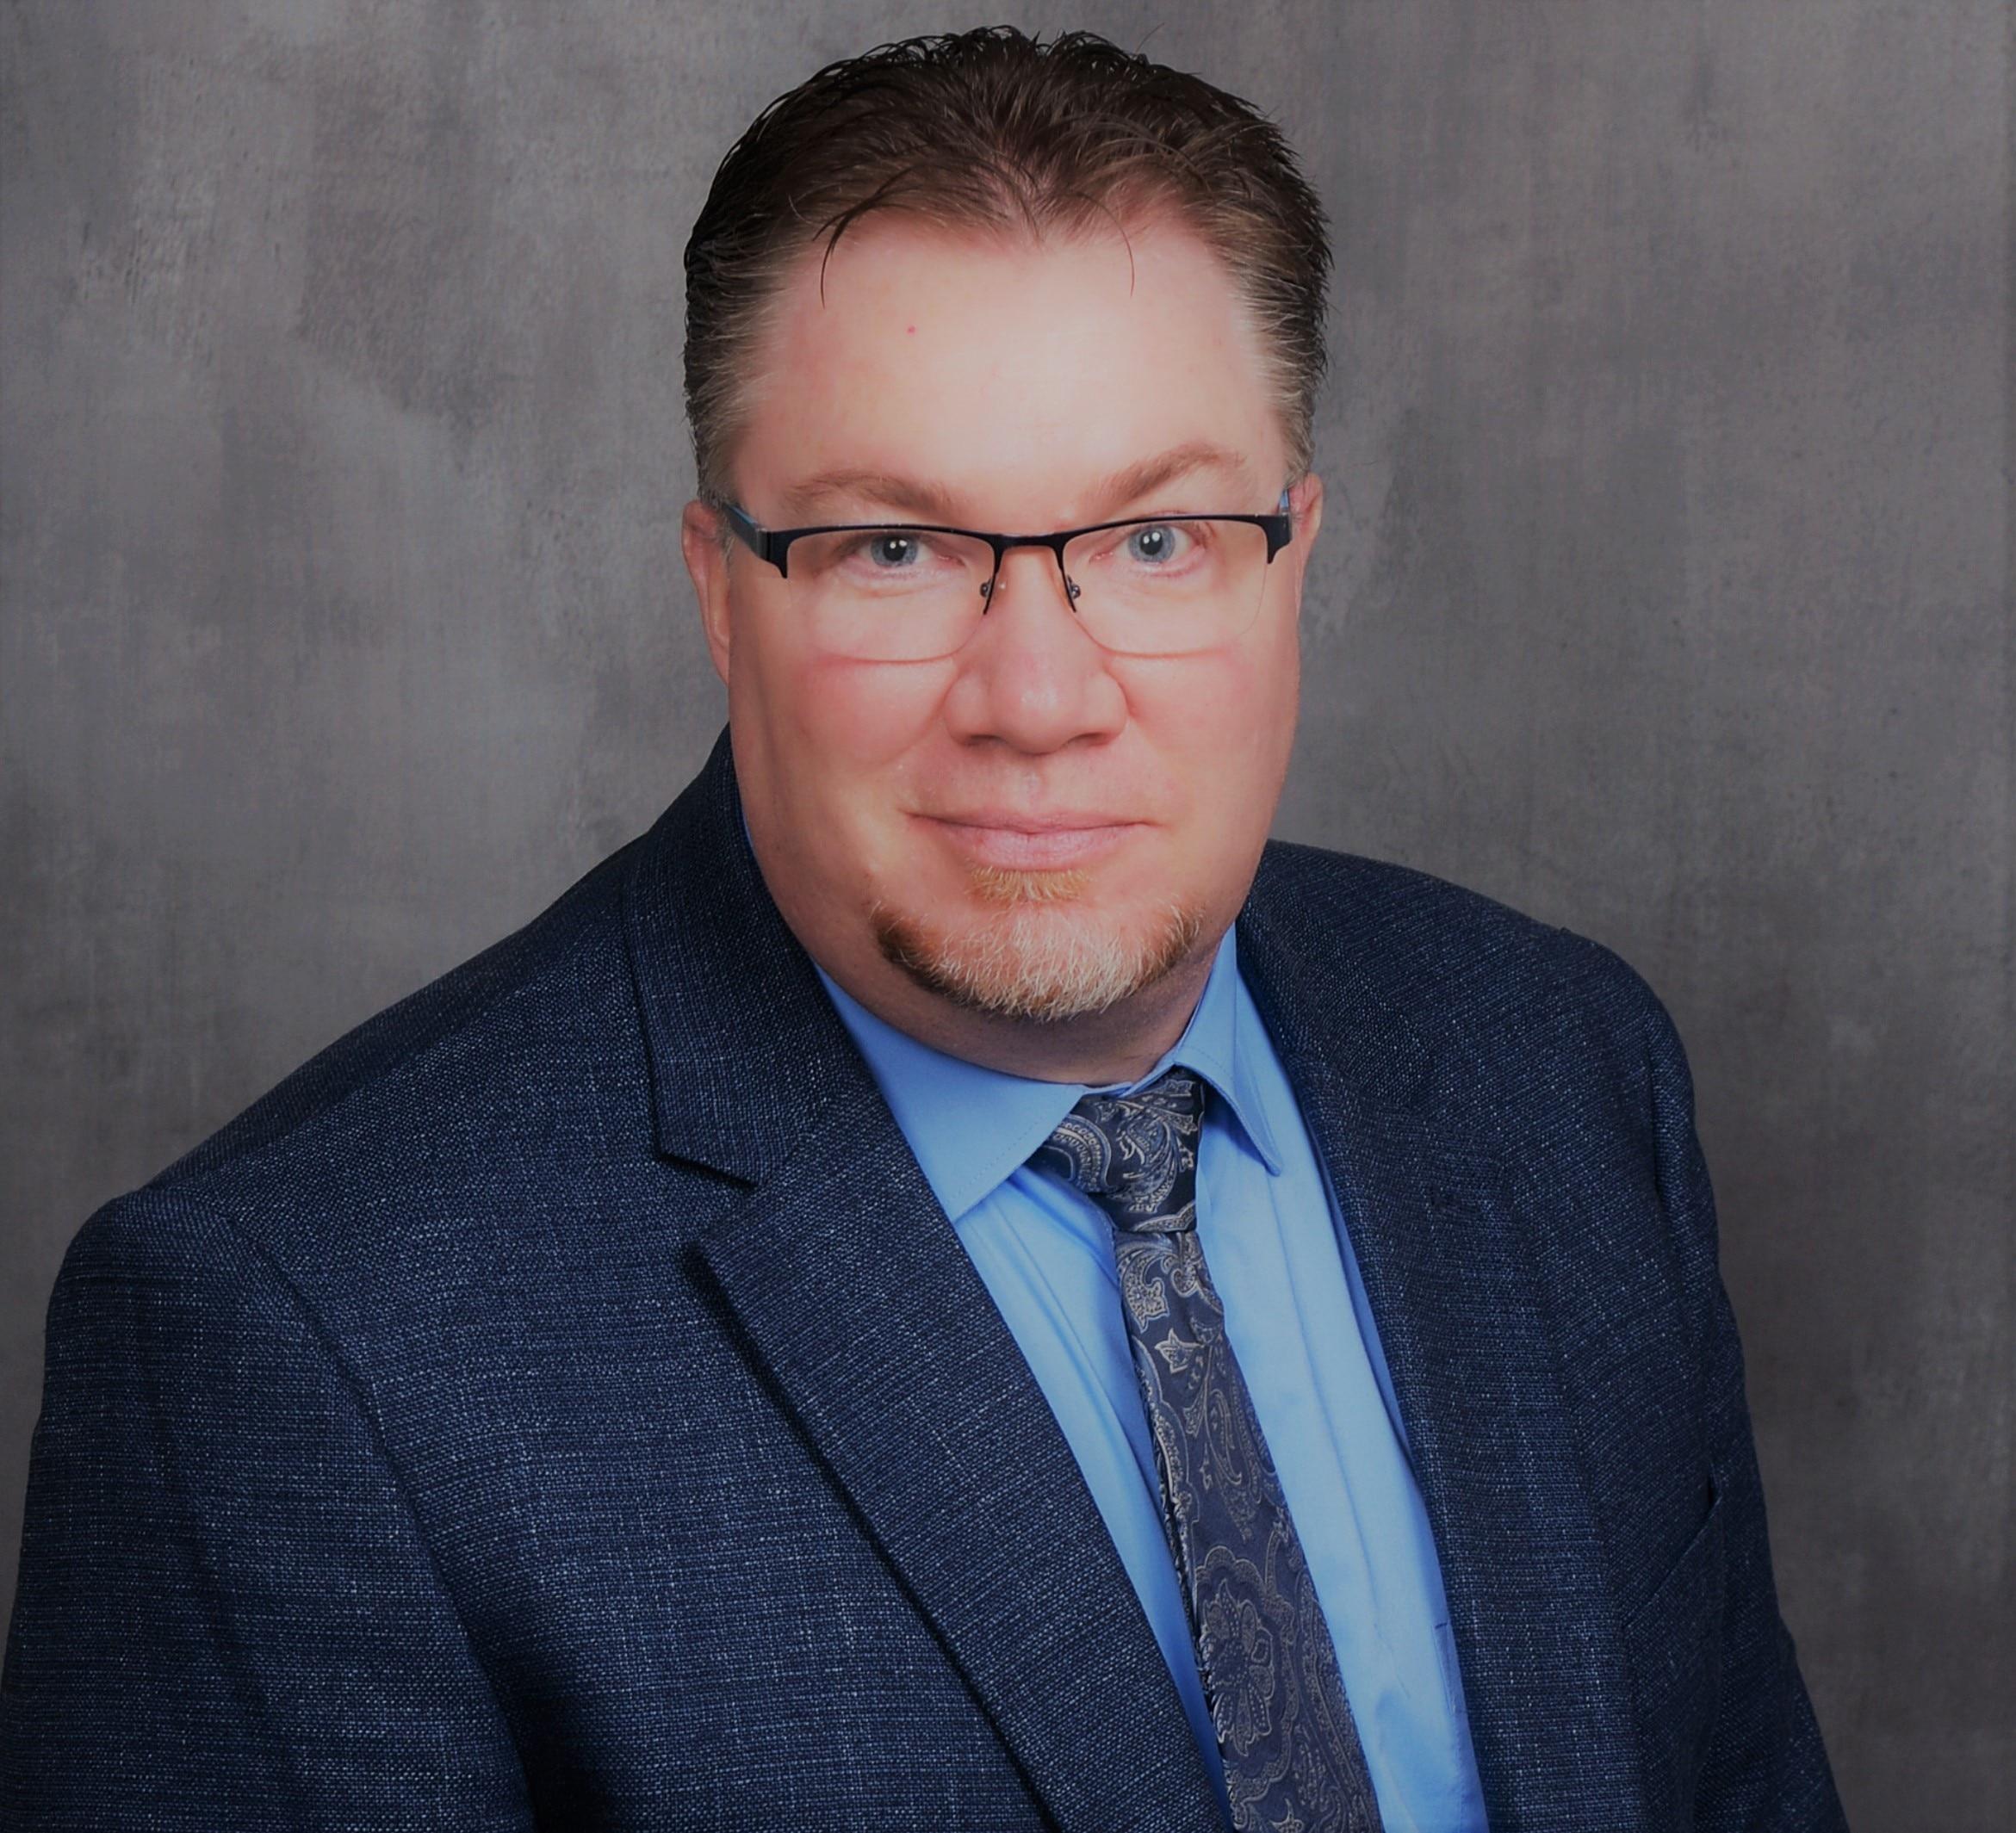 BRETT MCMAHON Financial Professional & Insurance Agent